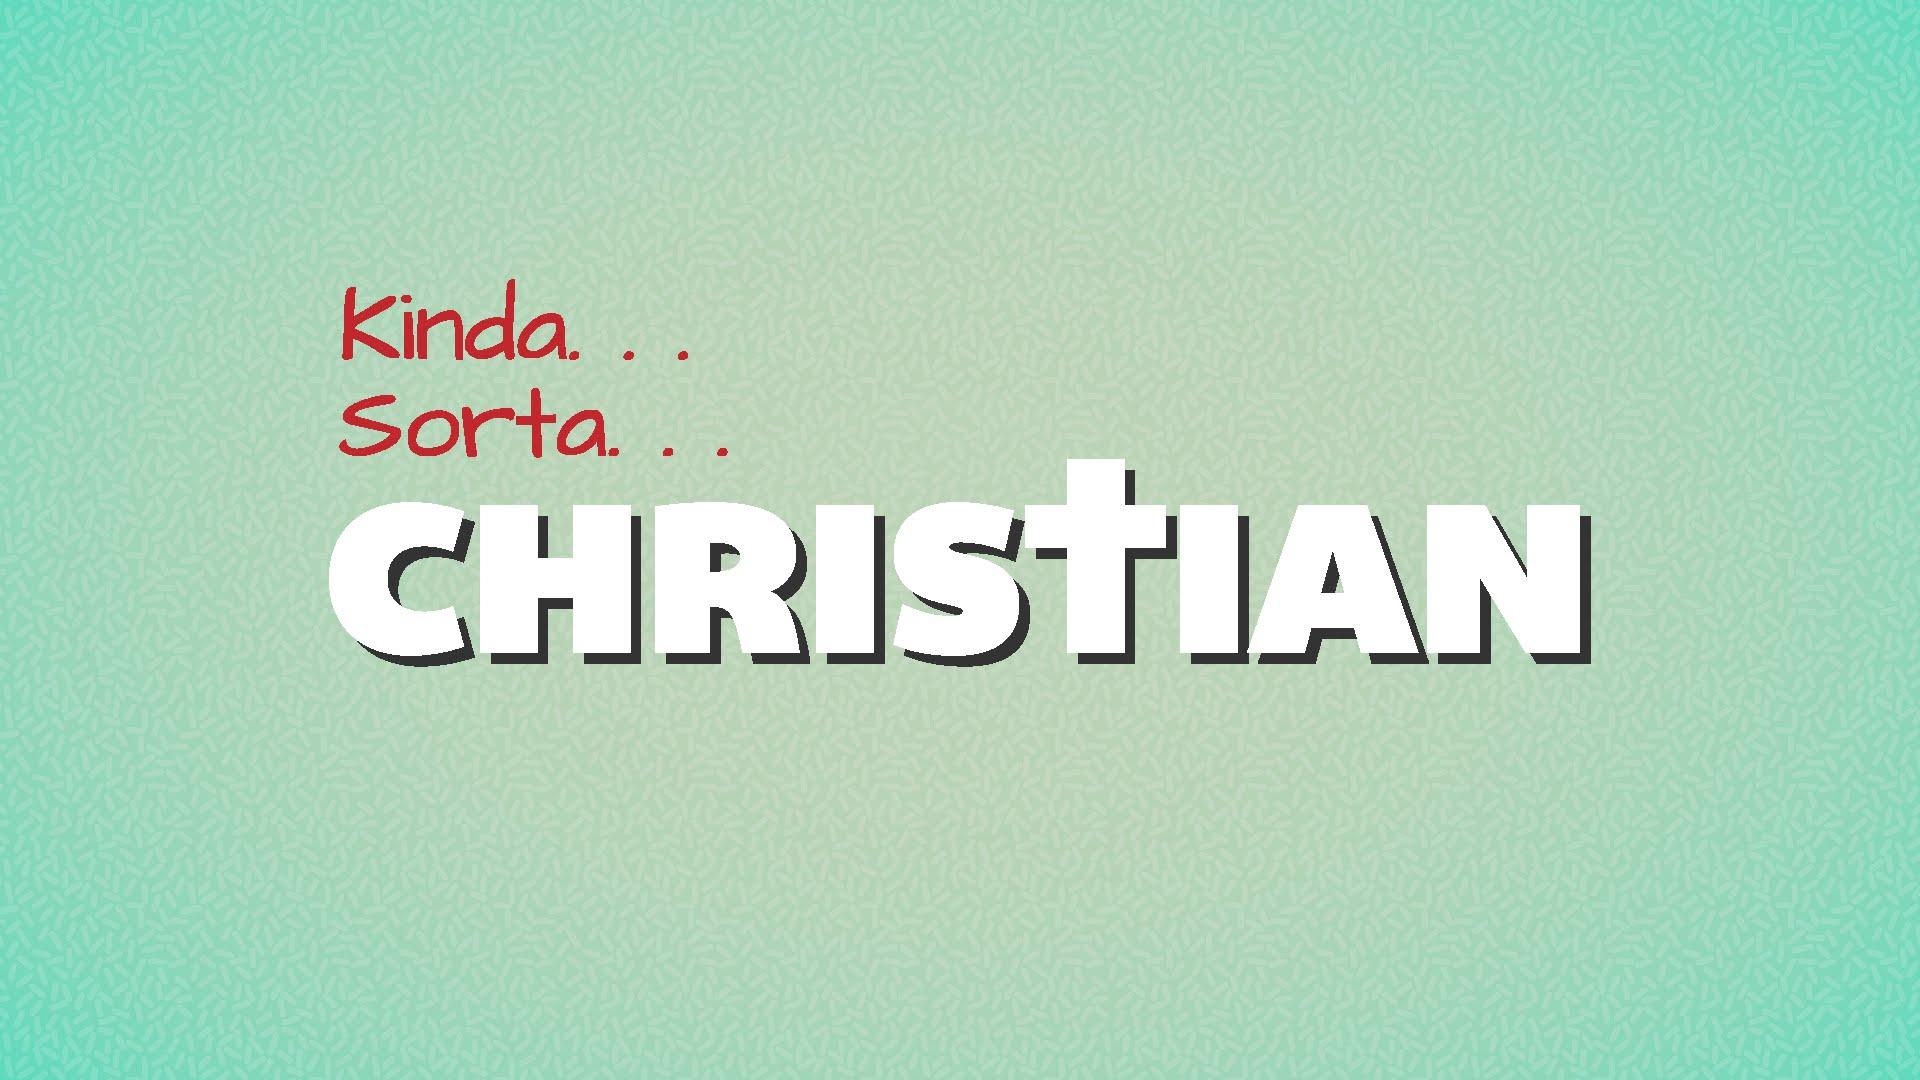 Kinda Sorta Christian: Я верю в Бога, но не доверяю ему полностью